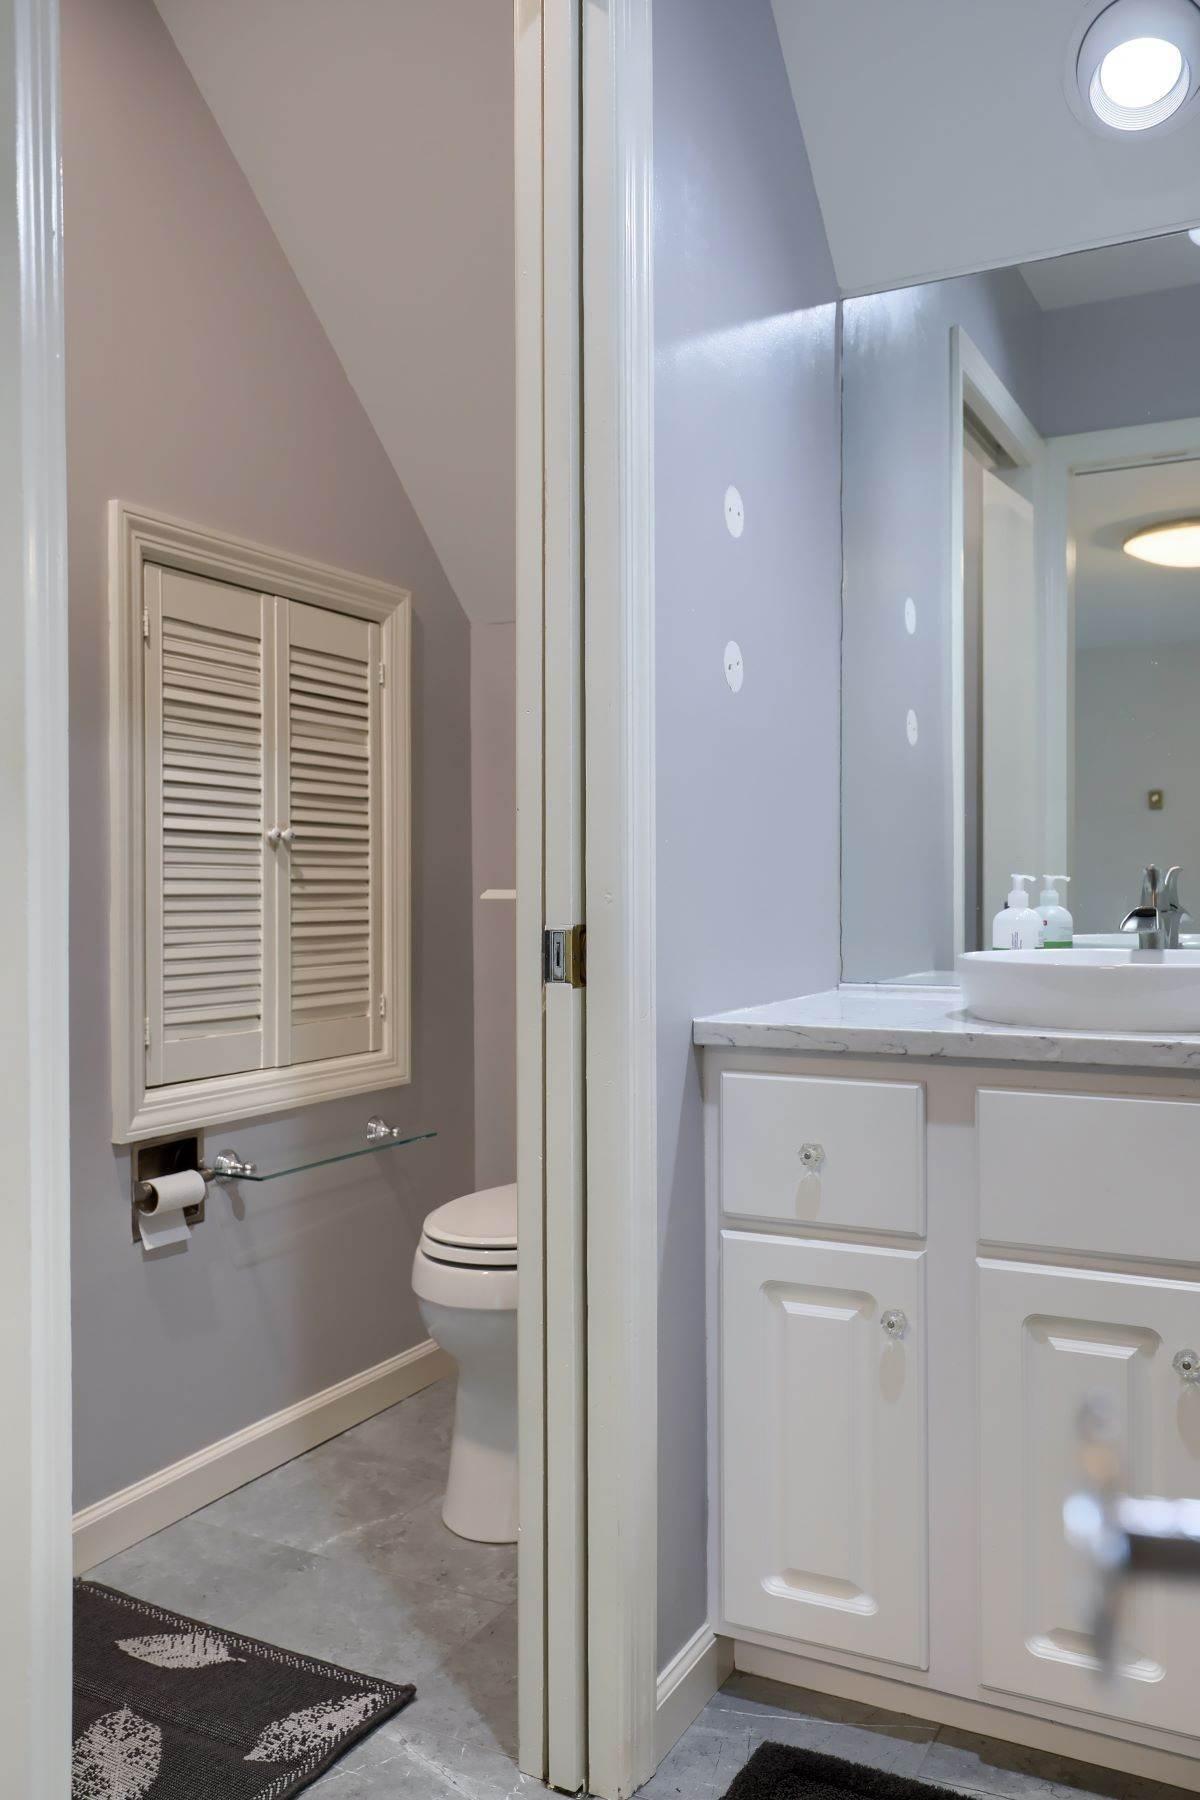 35. Single Family Homes for Sale at 206 E Granada Ave Hershey, Pennsylvania 17033 United States